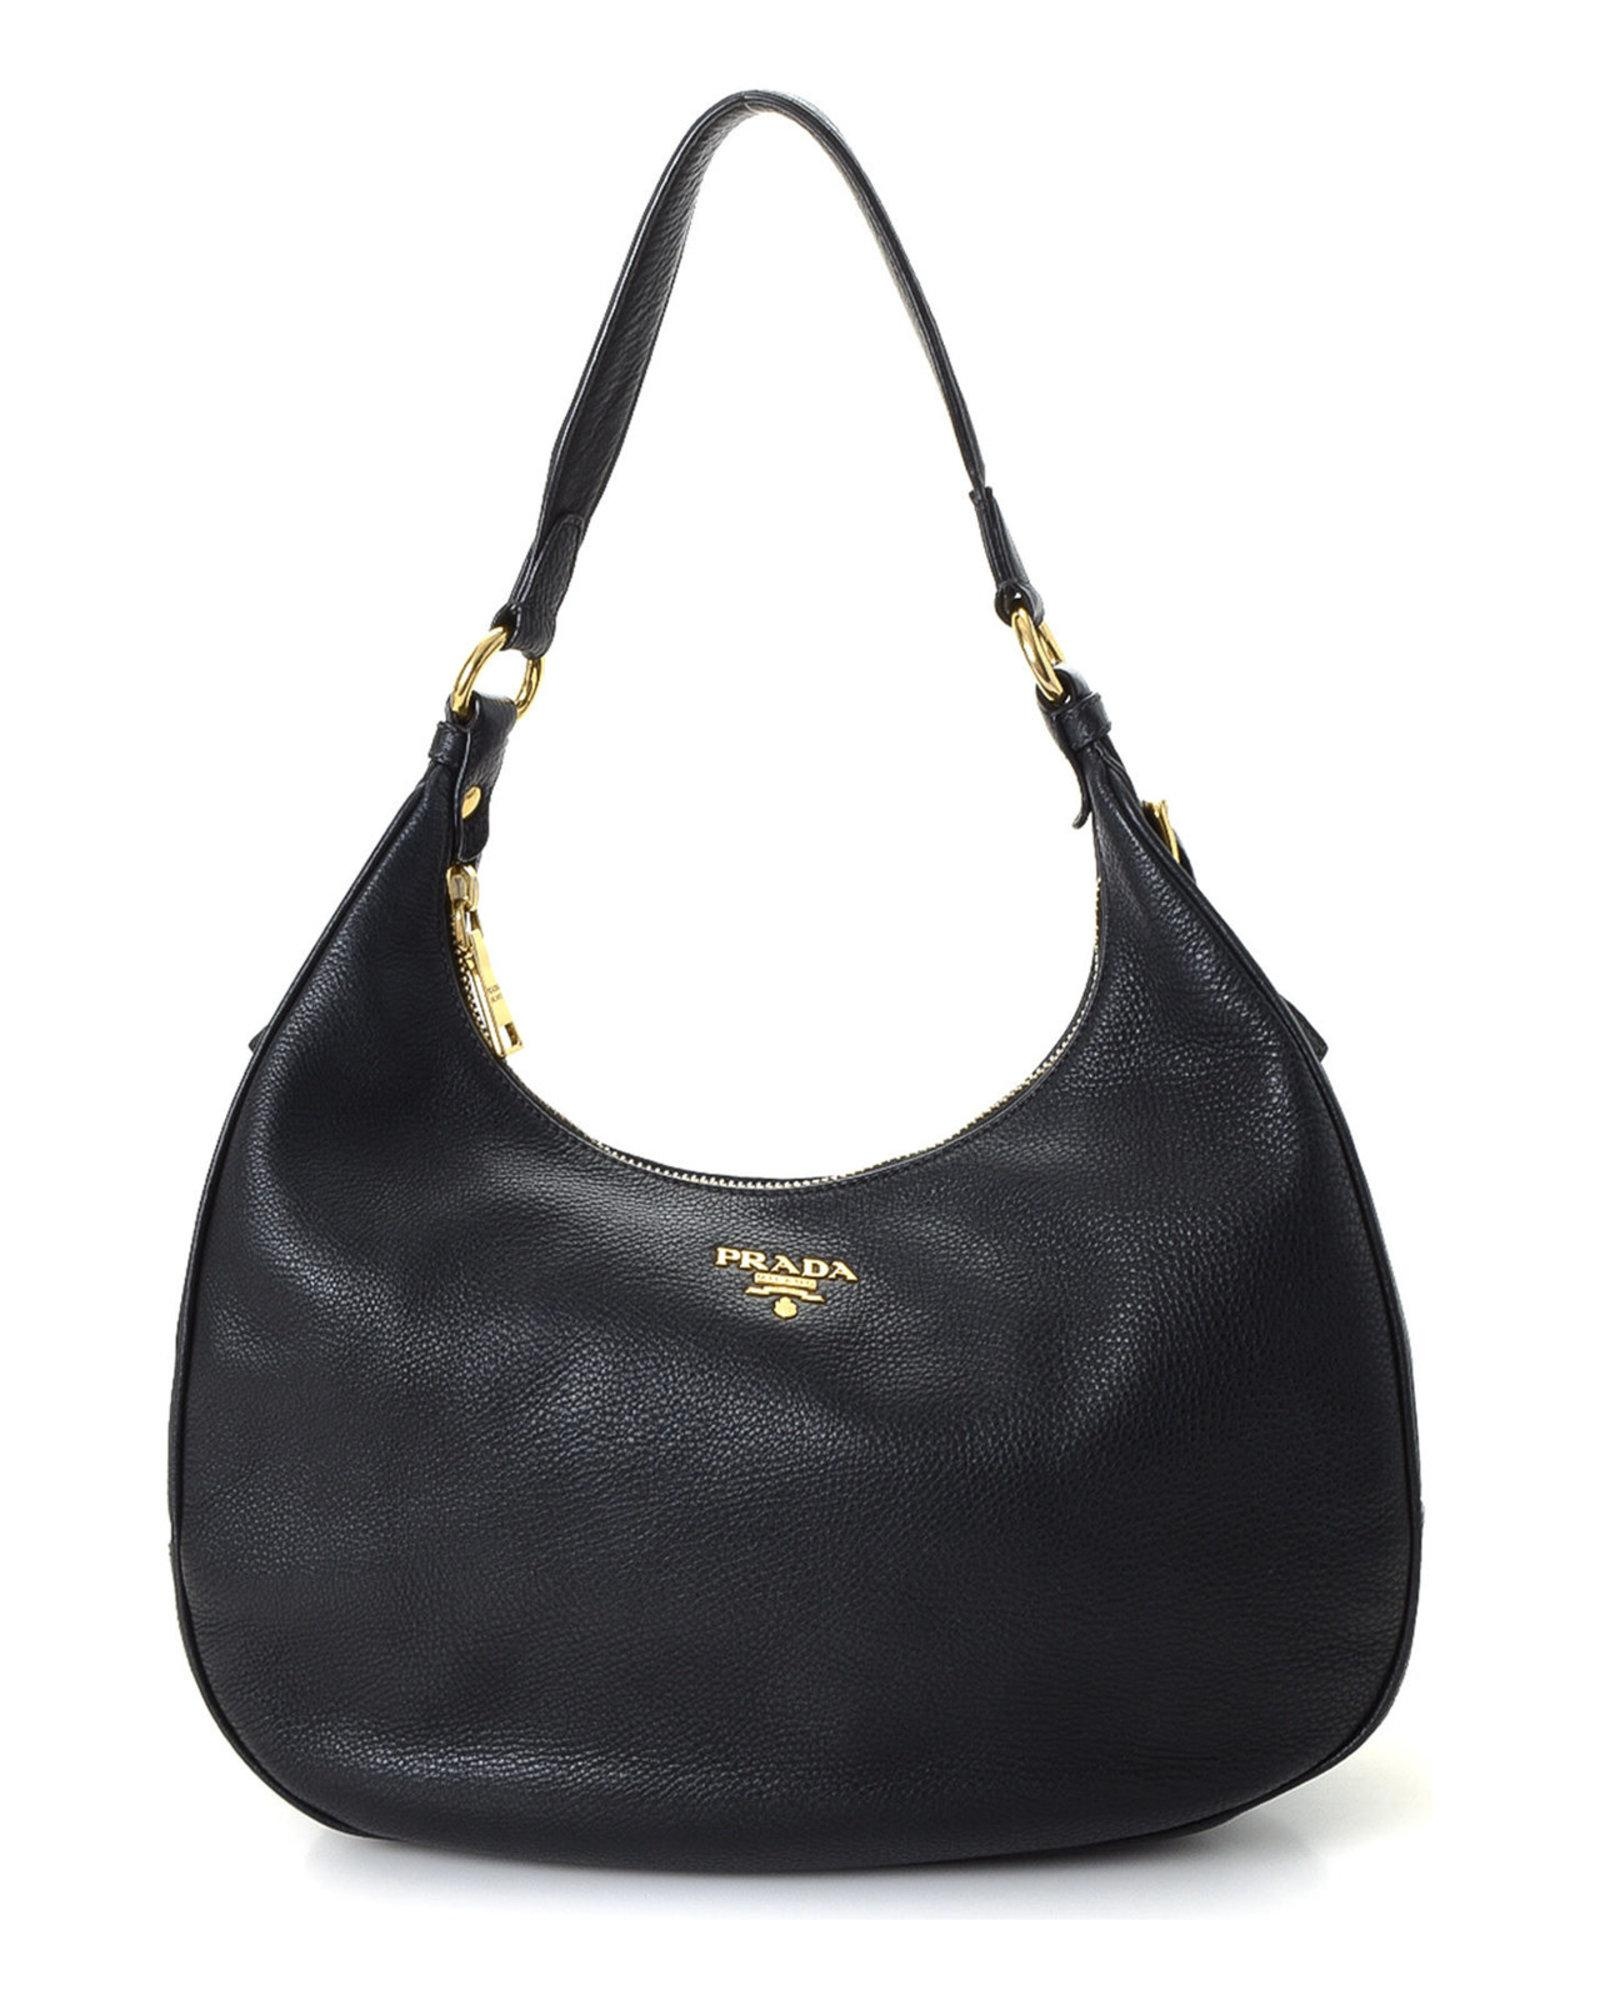 4d8774d81c41 Lyst - Prada Vitello Daino Hobo Shoulder Bag - Vintage in Black